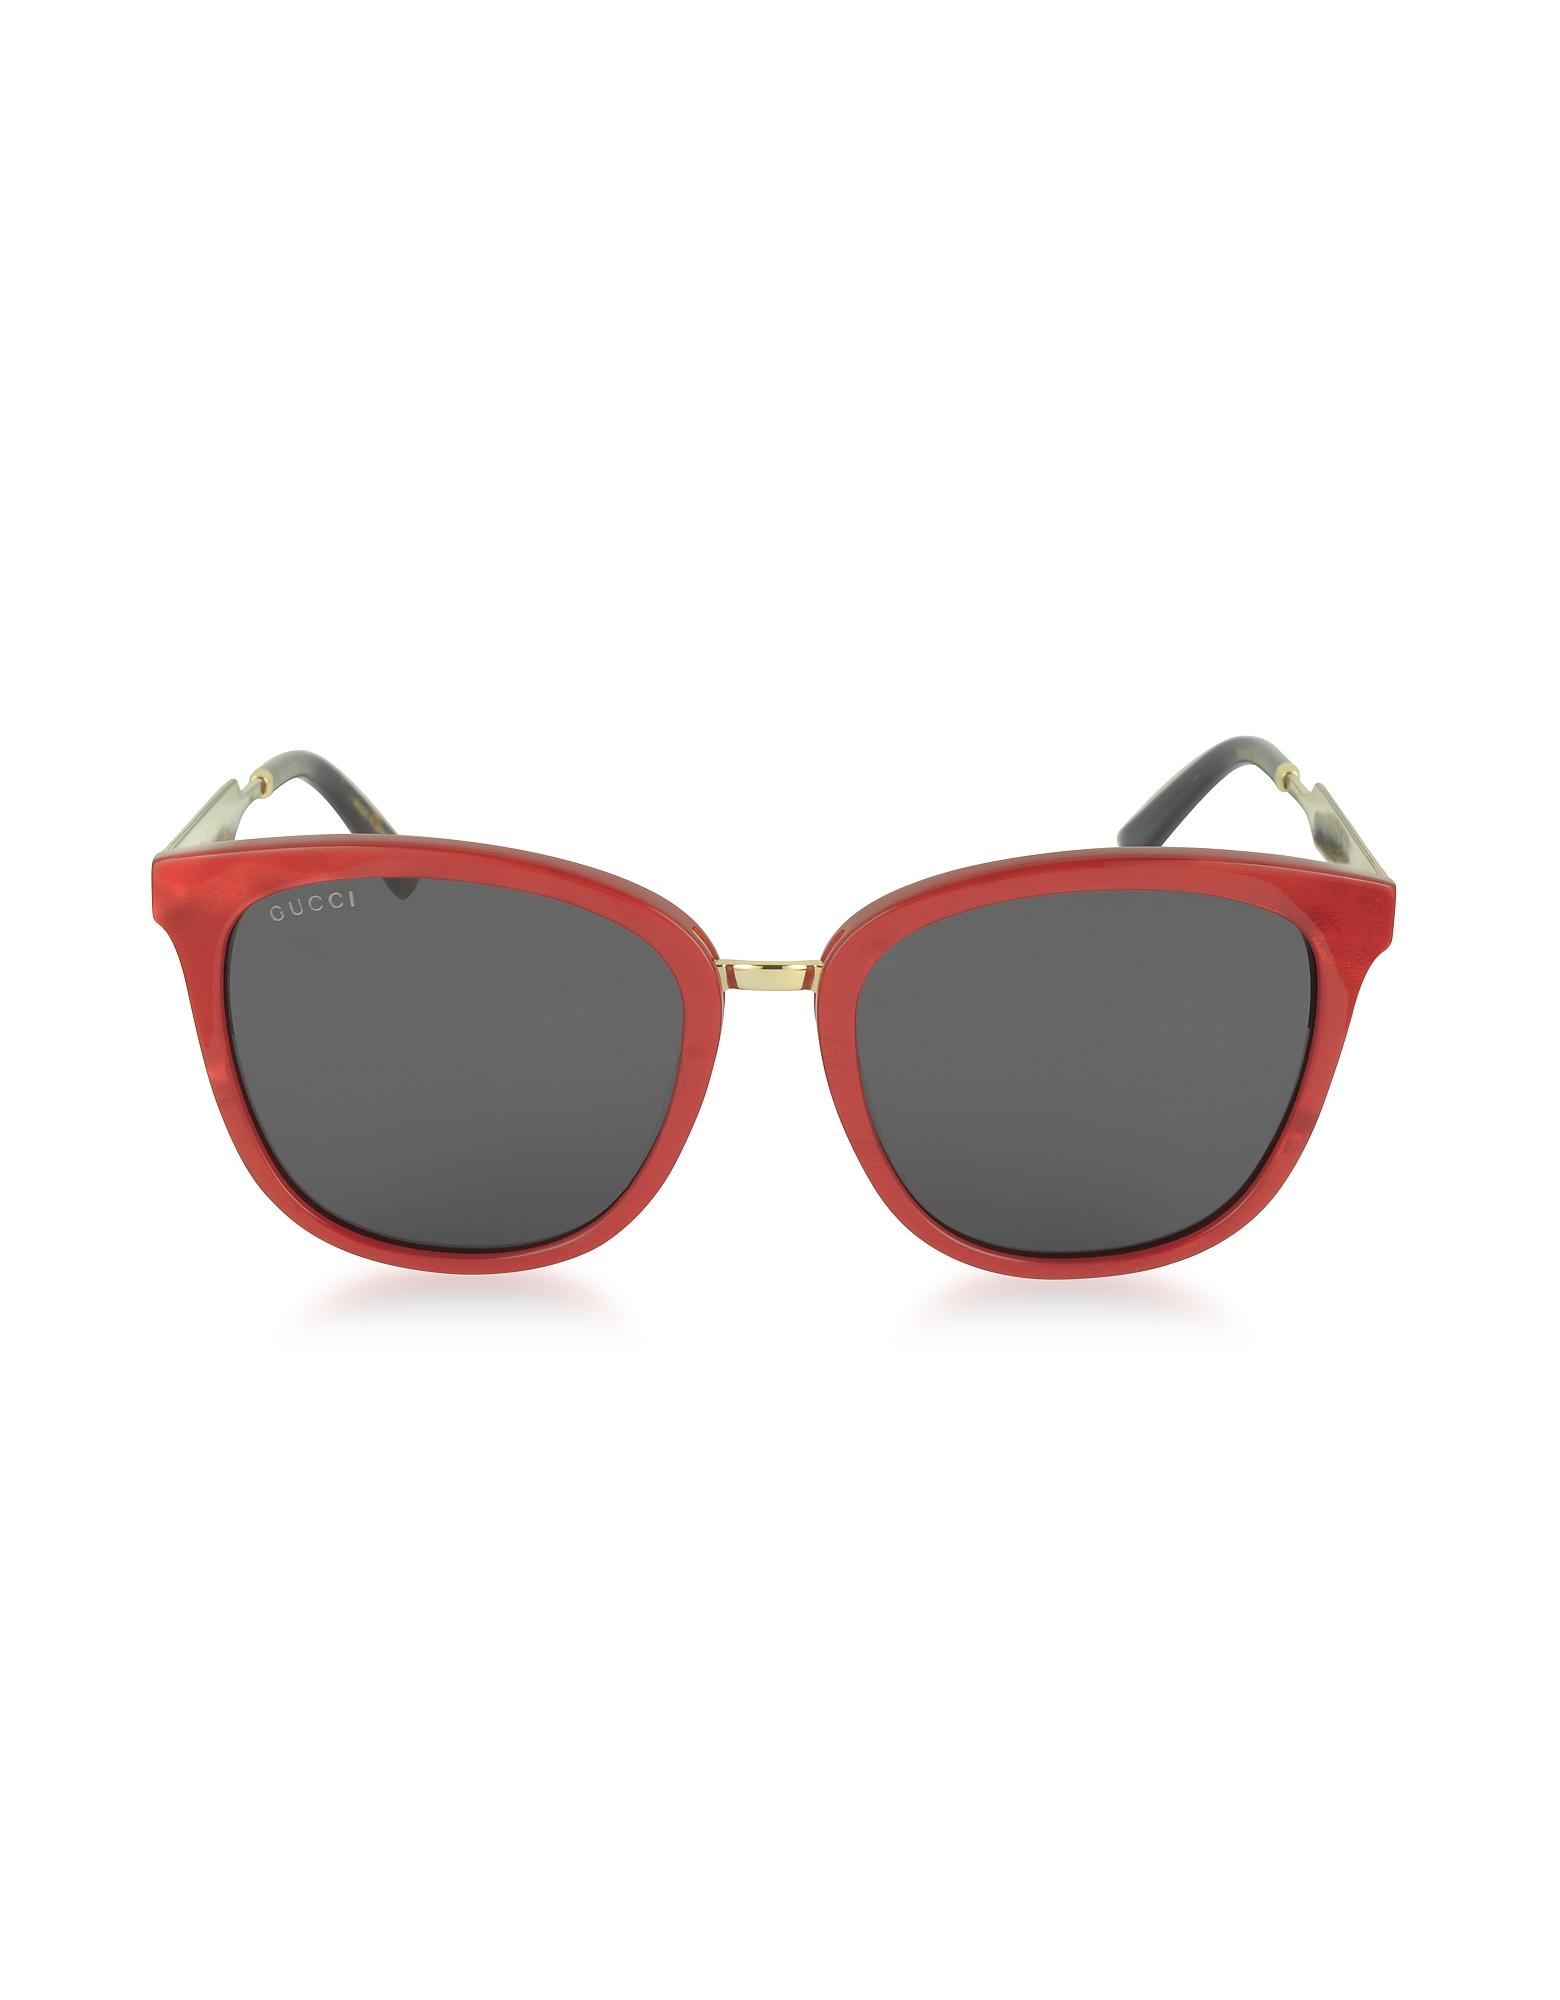 Gucci Sunglasses, GG0073S Acetate and Gold Metal Round Women's Sunglasses